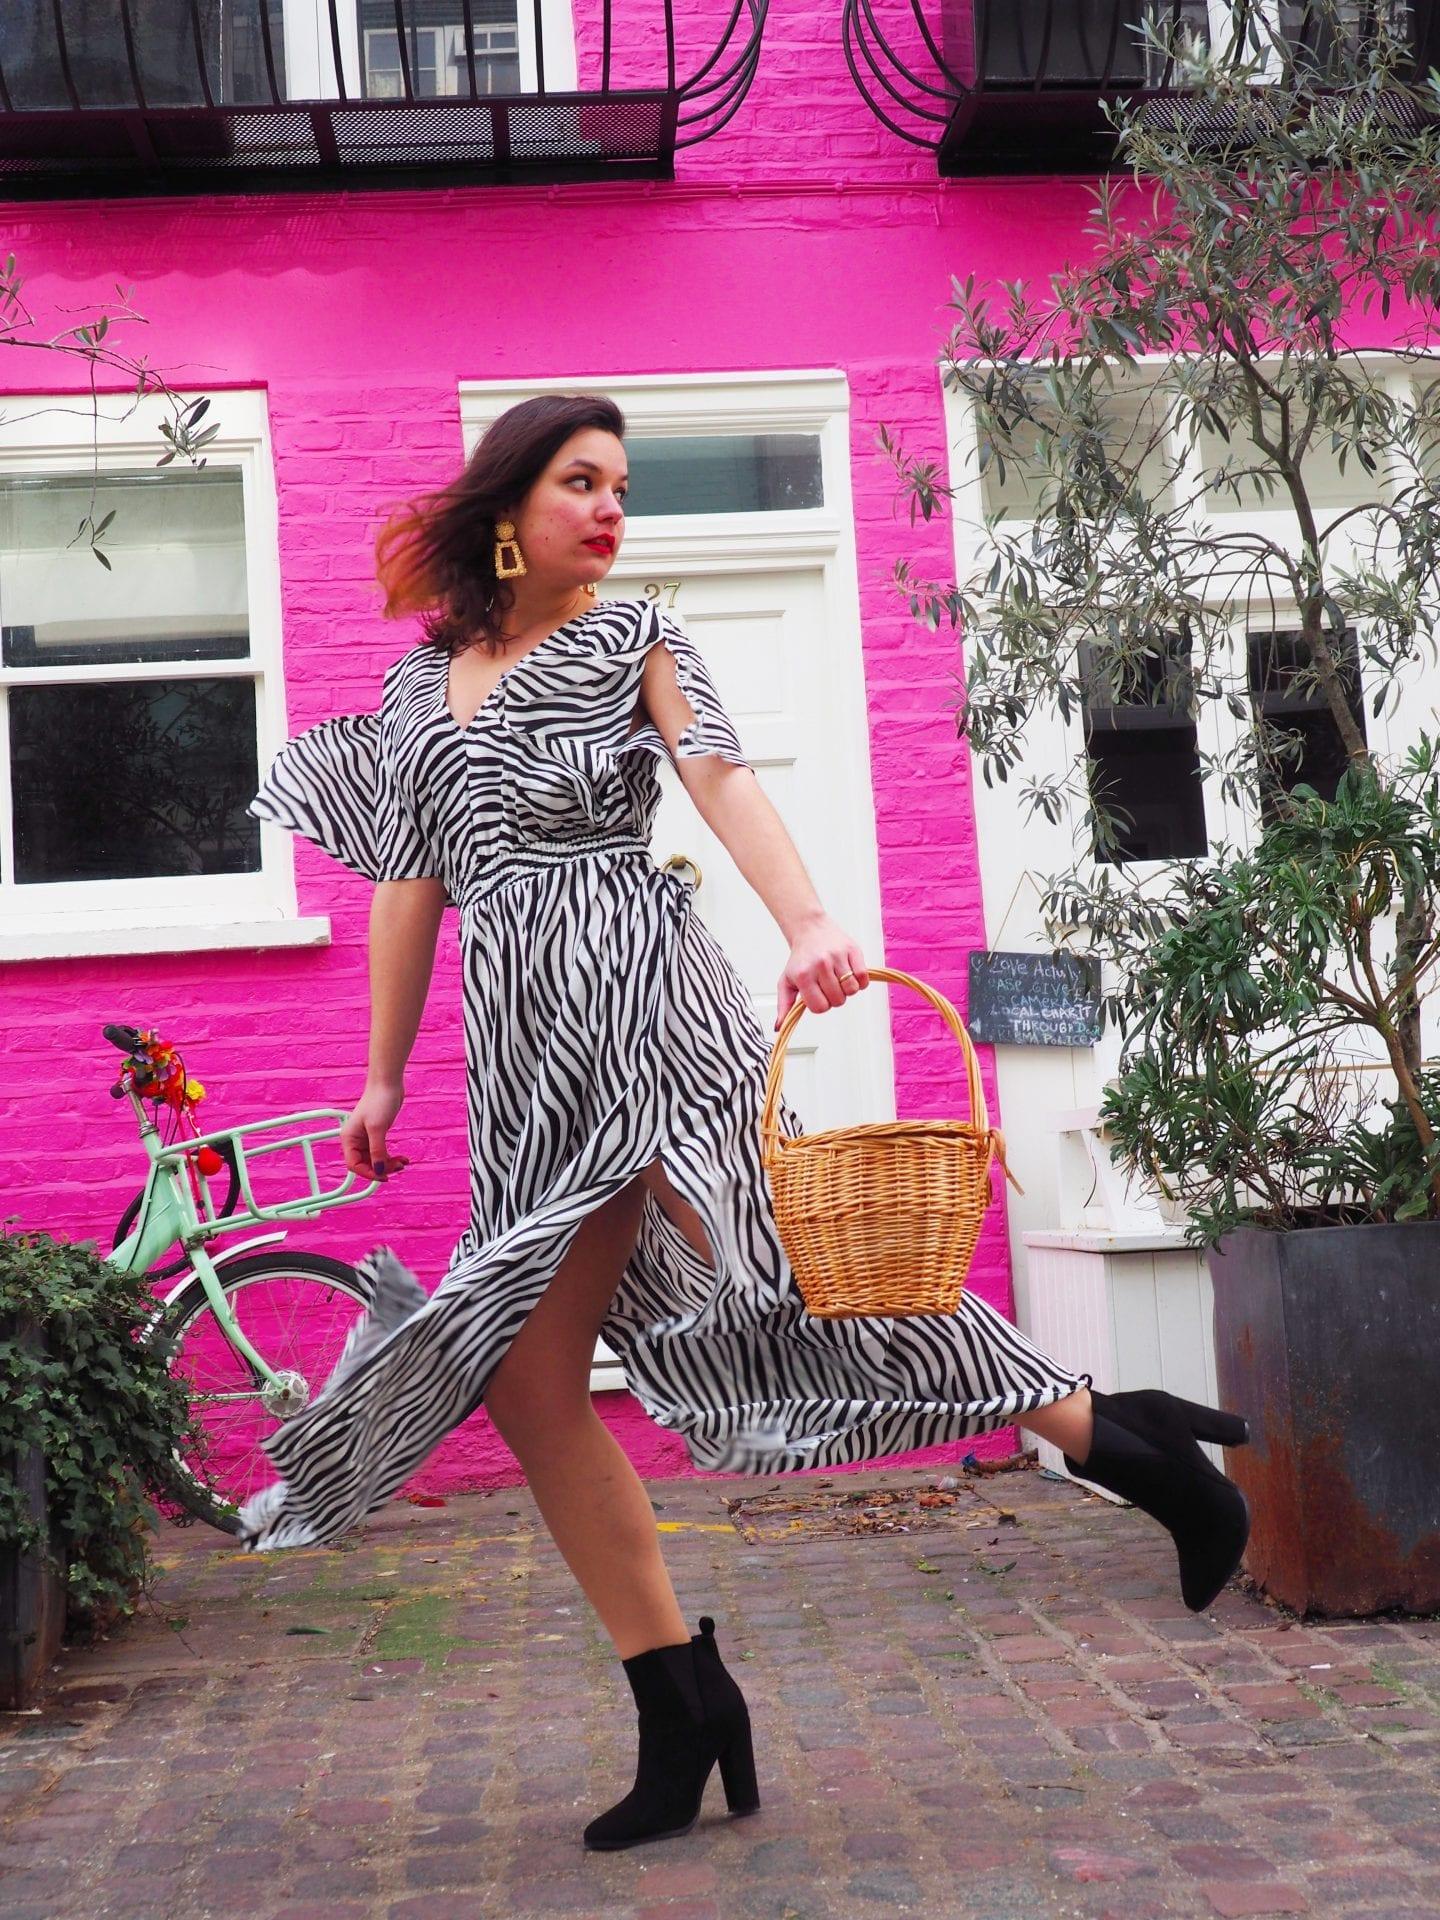 caea2b62fc Dear To Wear The Zebra Print - Fashion   Style With Corinne